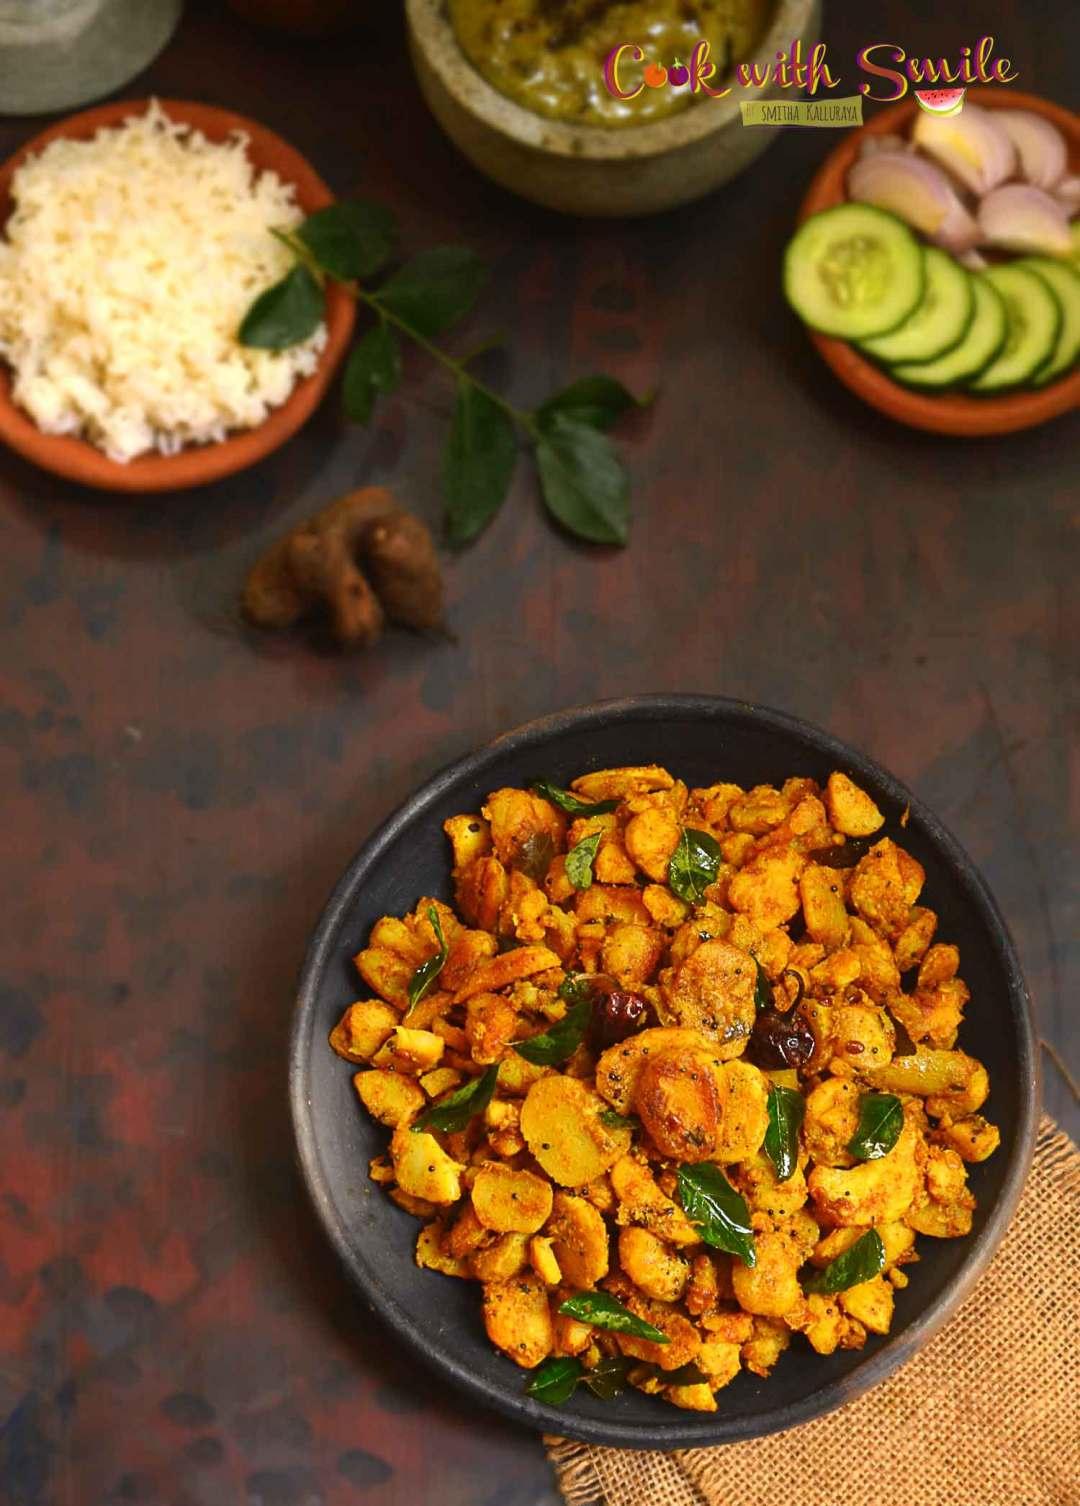 Chinese Potato Indian Stir Fry